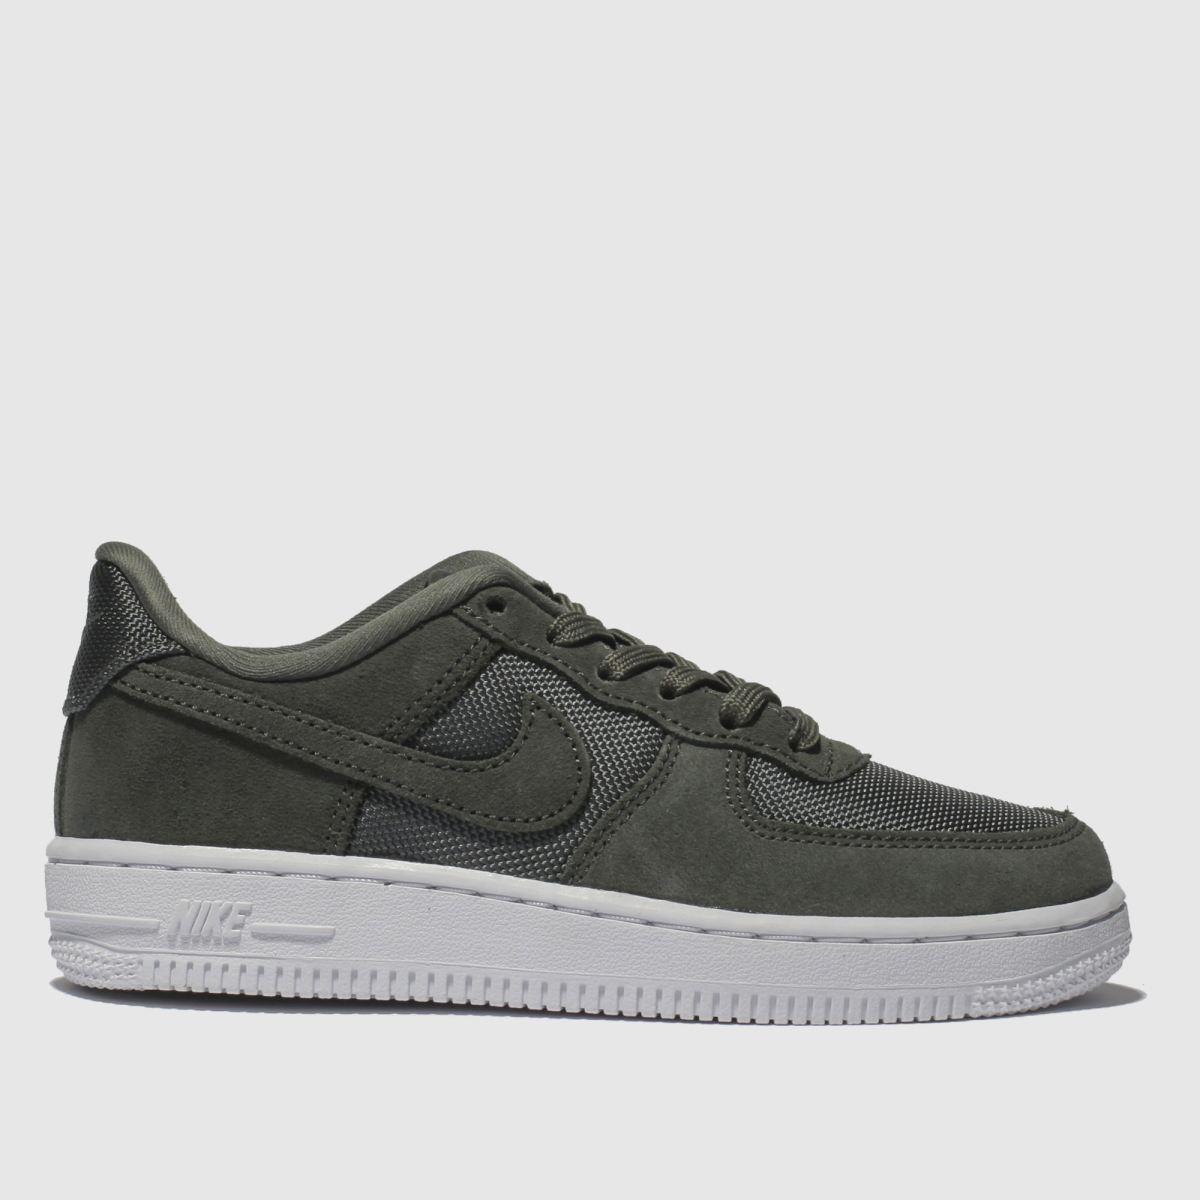 Nike Khaki Air Force 1-1 Trainers Junior